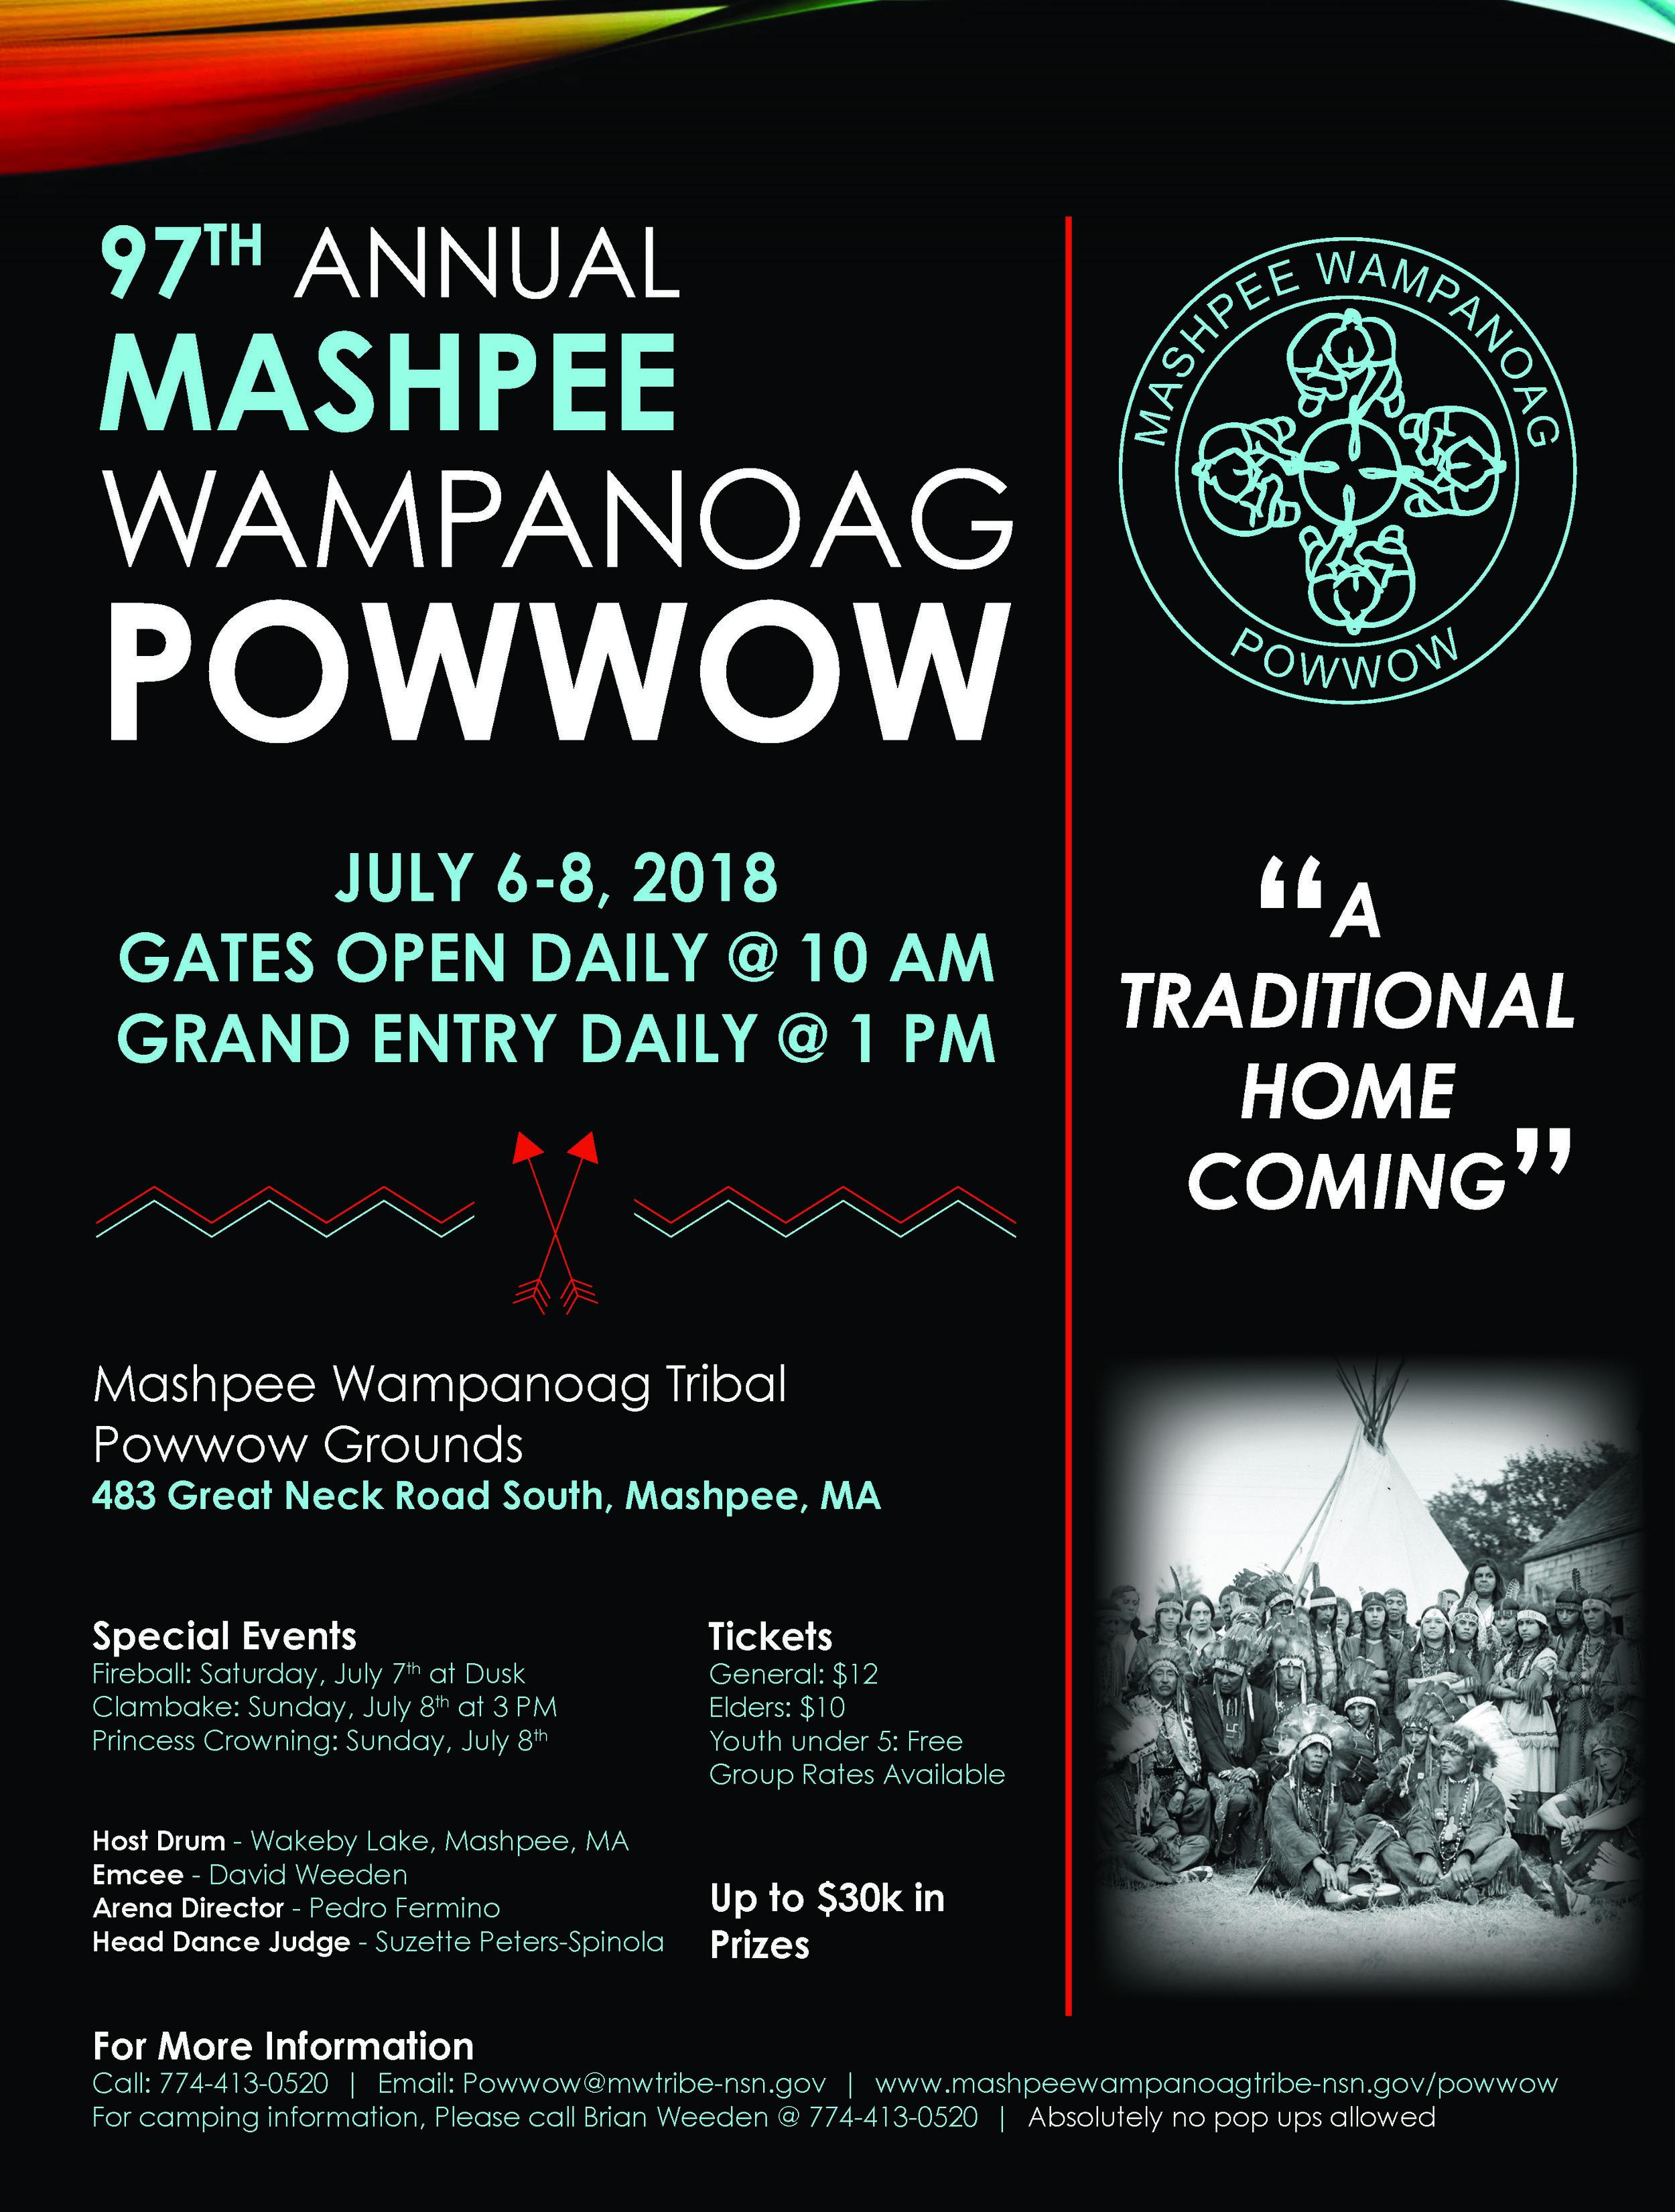 powwow-flyer-2018-05-21-18-b.jpg